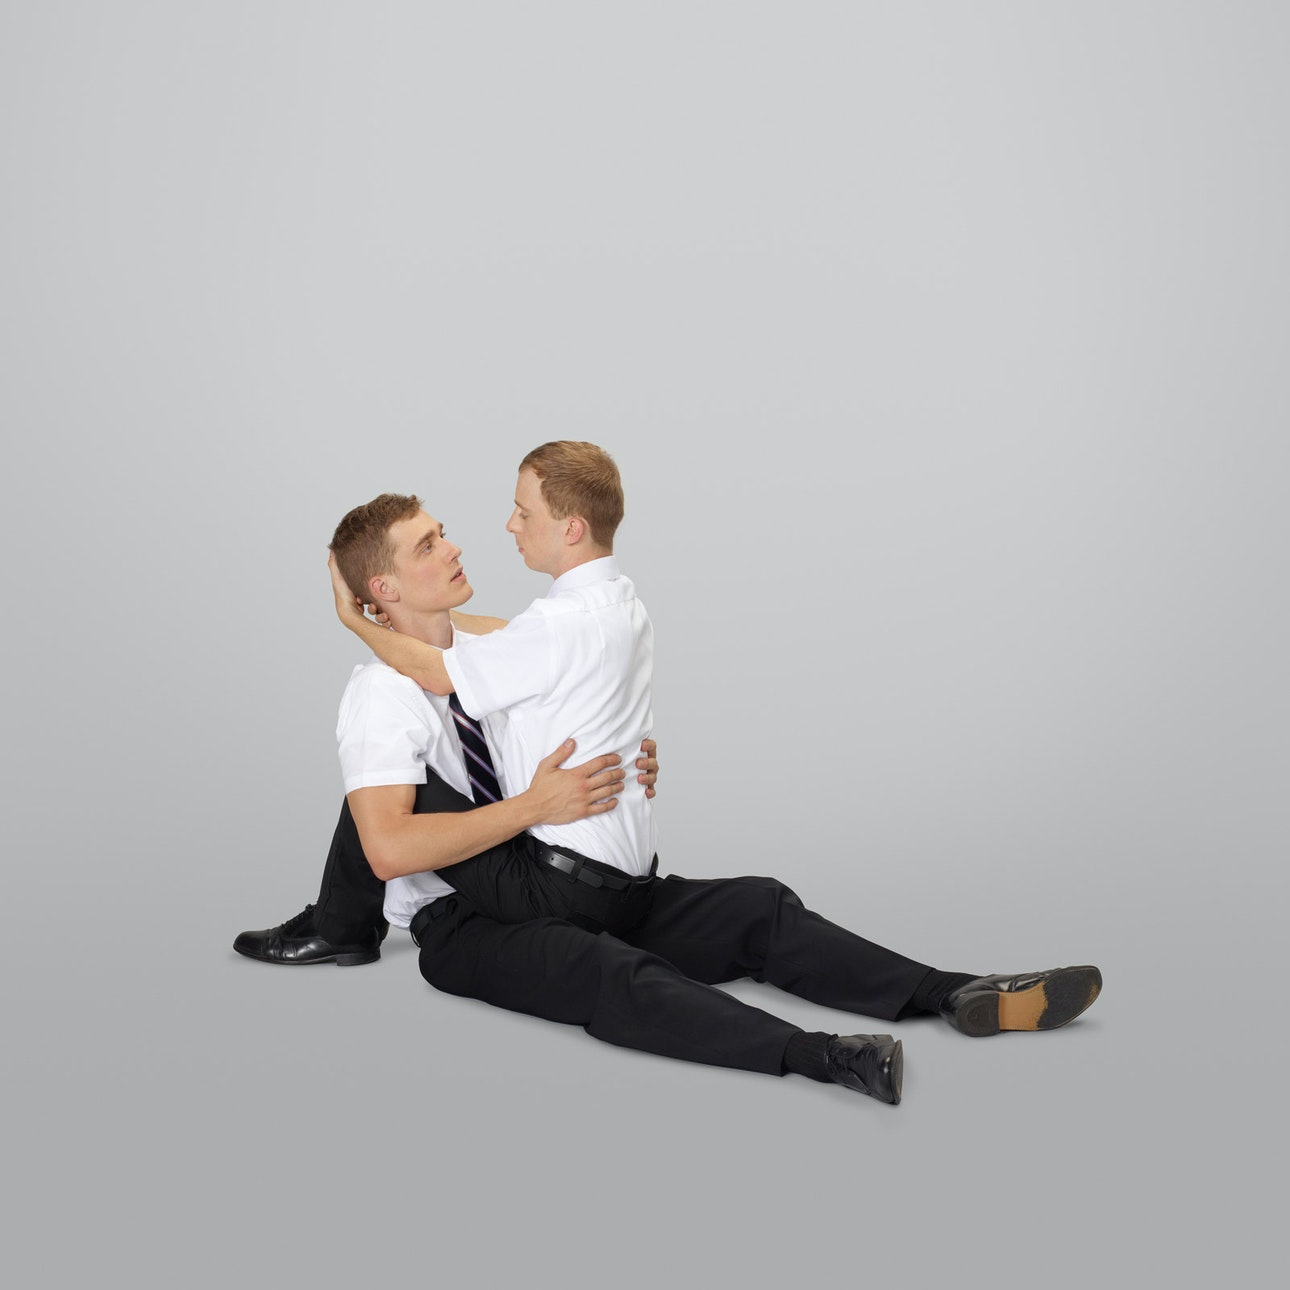 Dacosta_Mormons 8